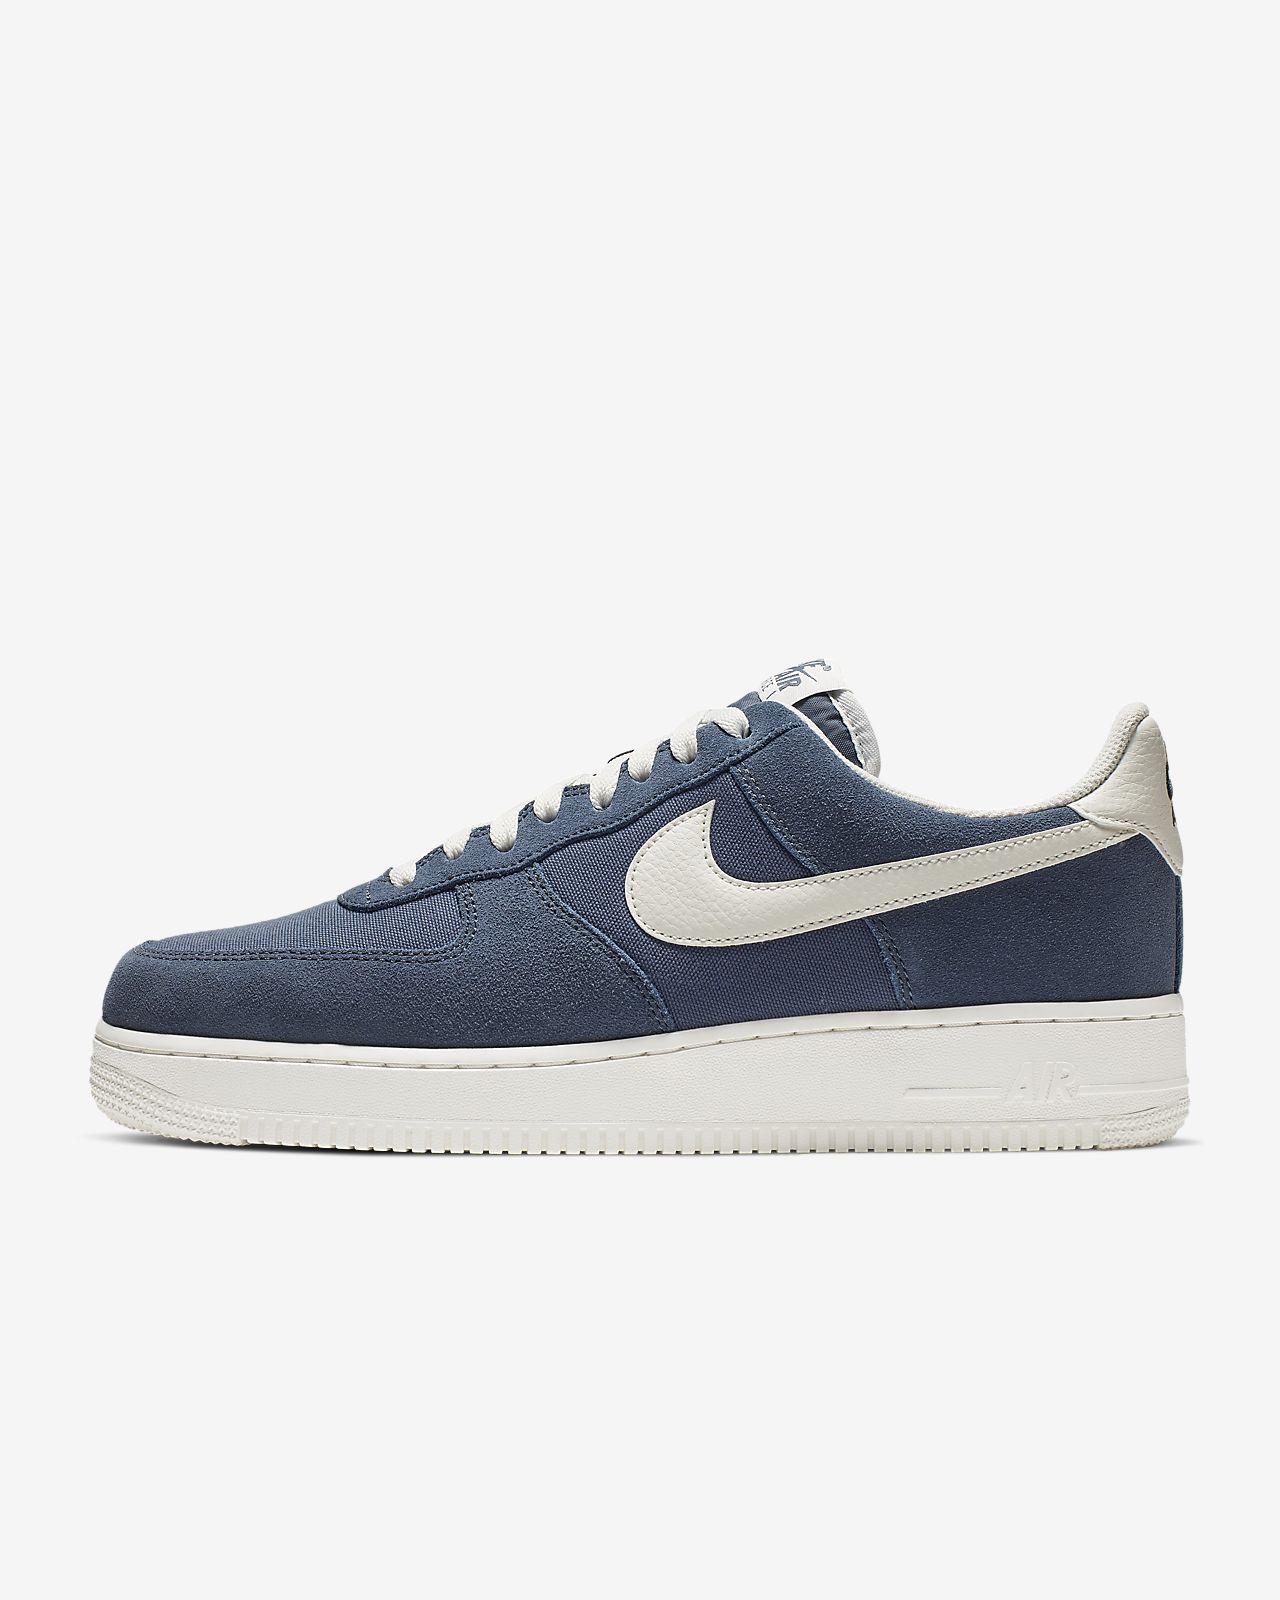 Nike Air Force 1 '07 2 男子运动鞋